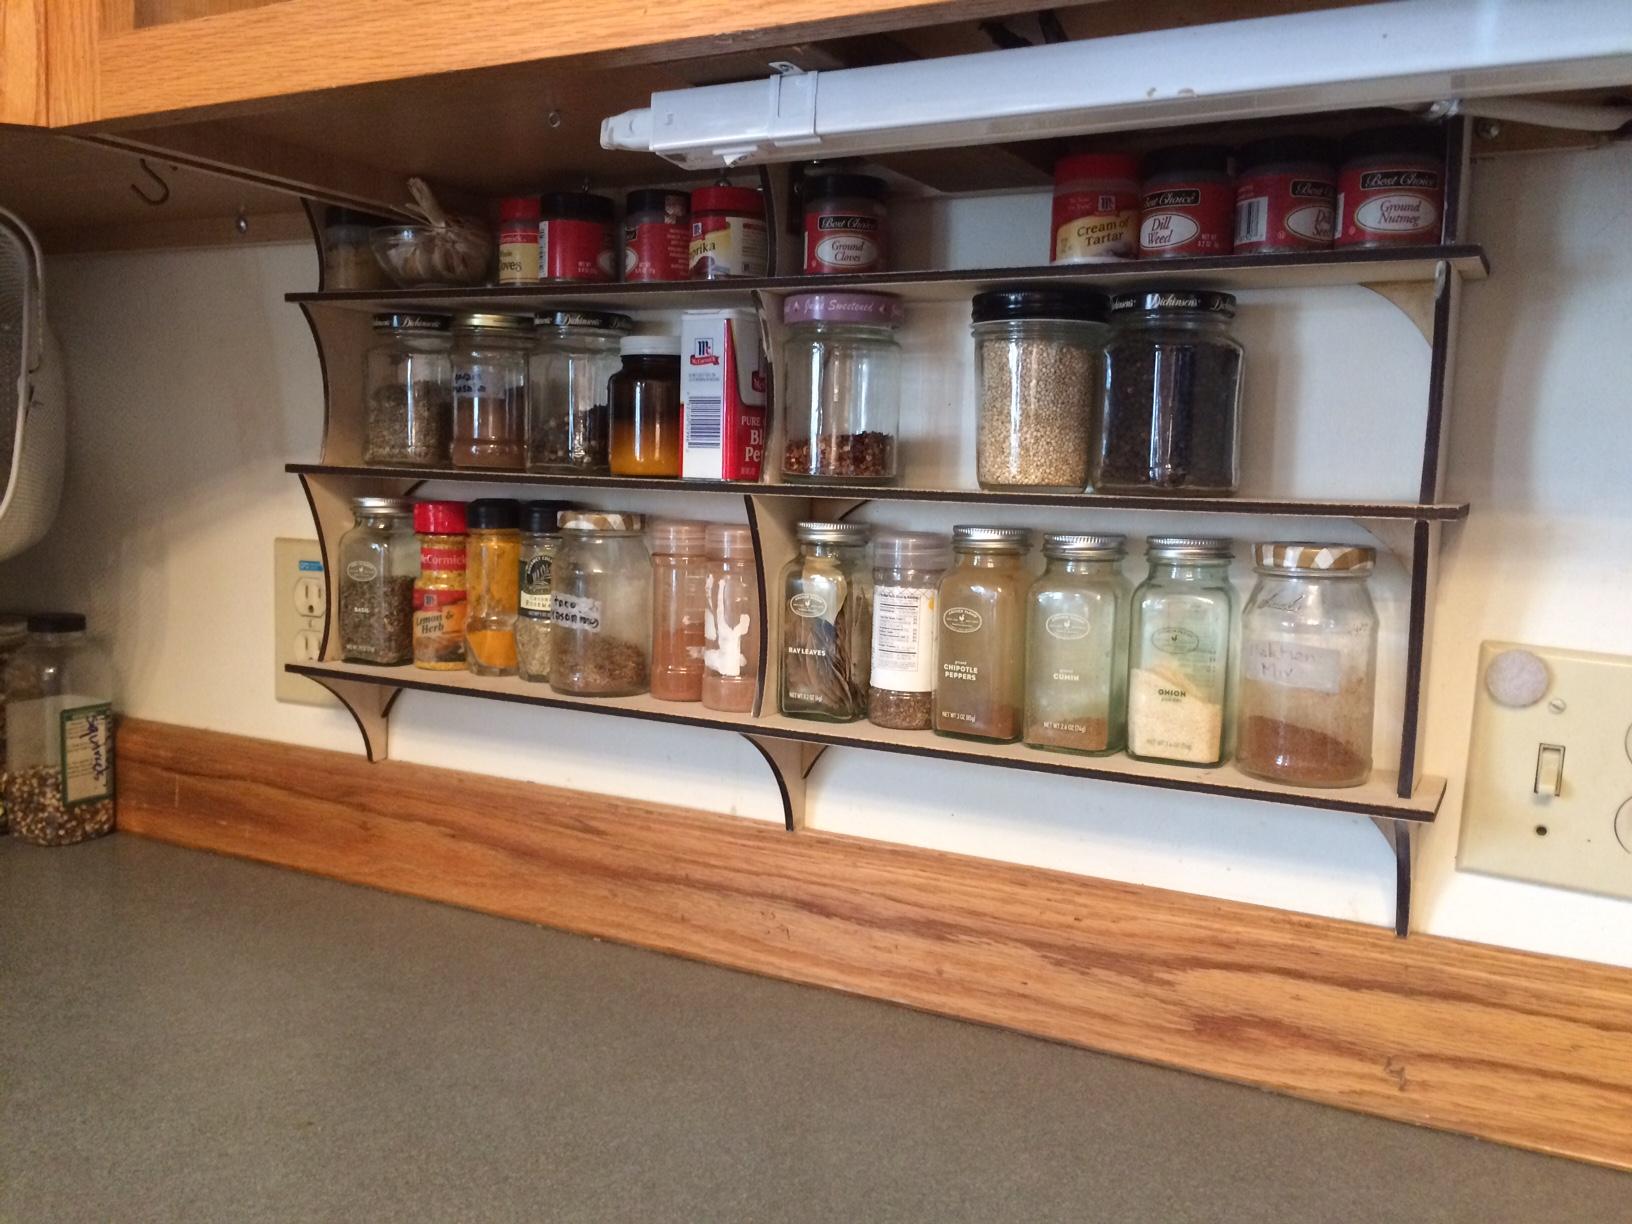 2 3 shelf 3 support & DIY Laser Cut Under Cabinet Shelves (spice rack tea shelf) u2013 nirak.net